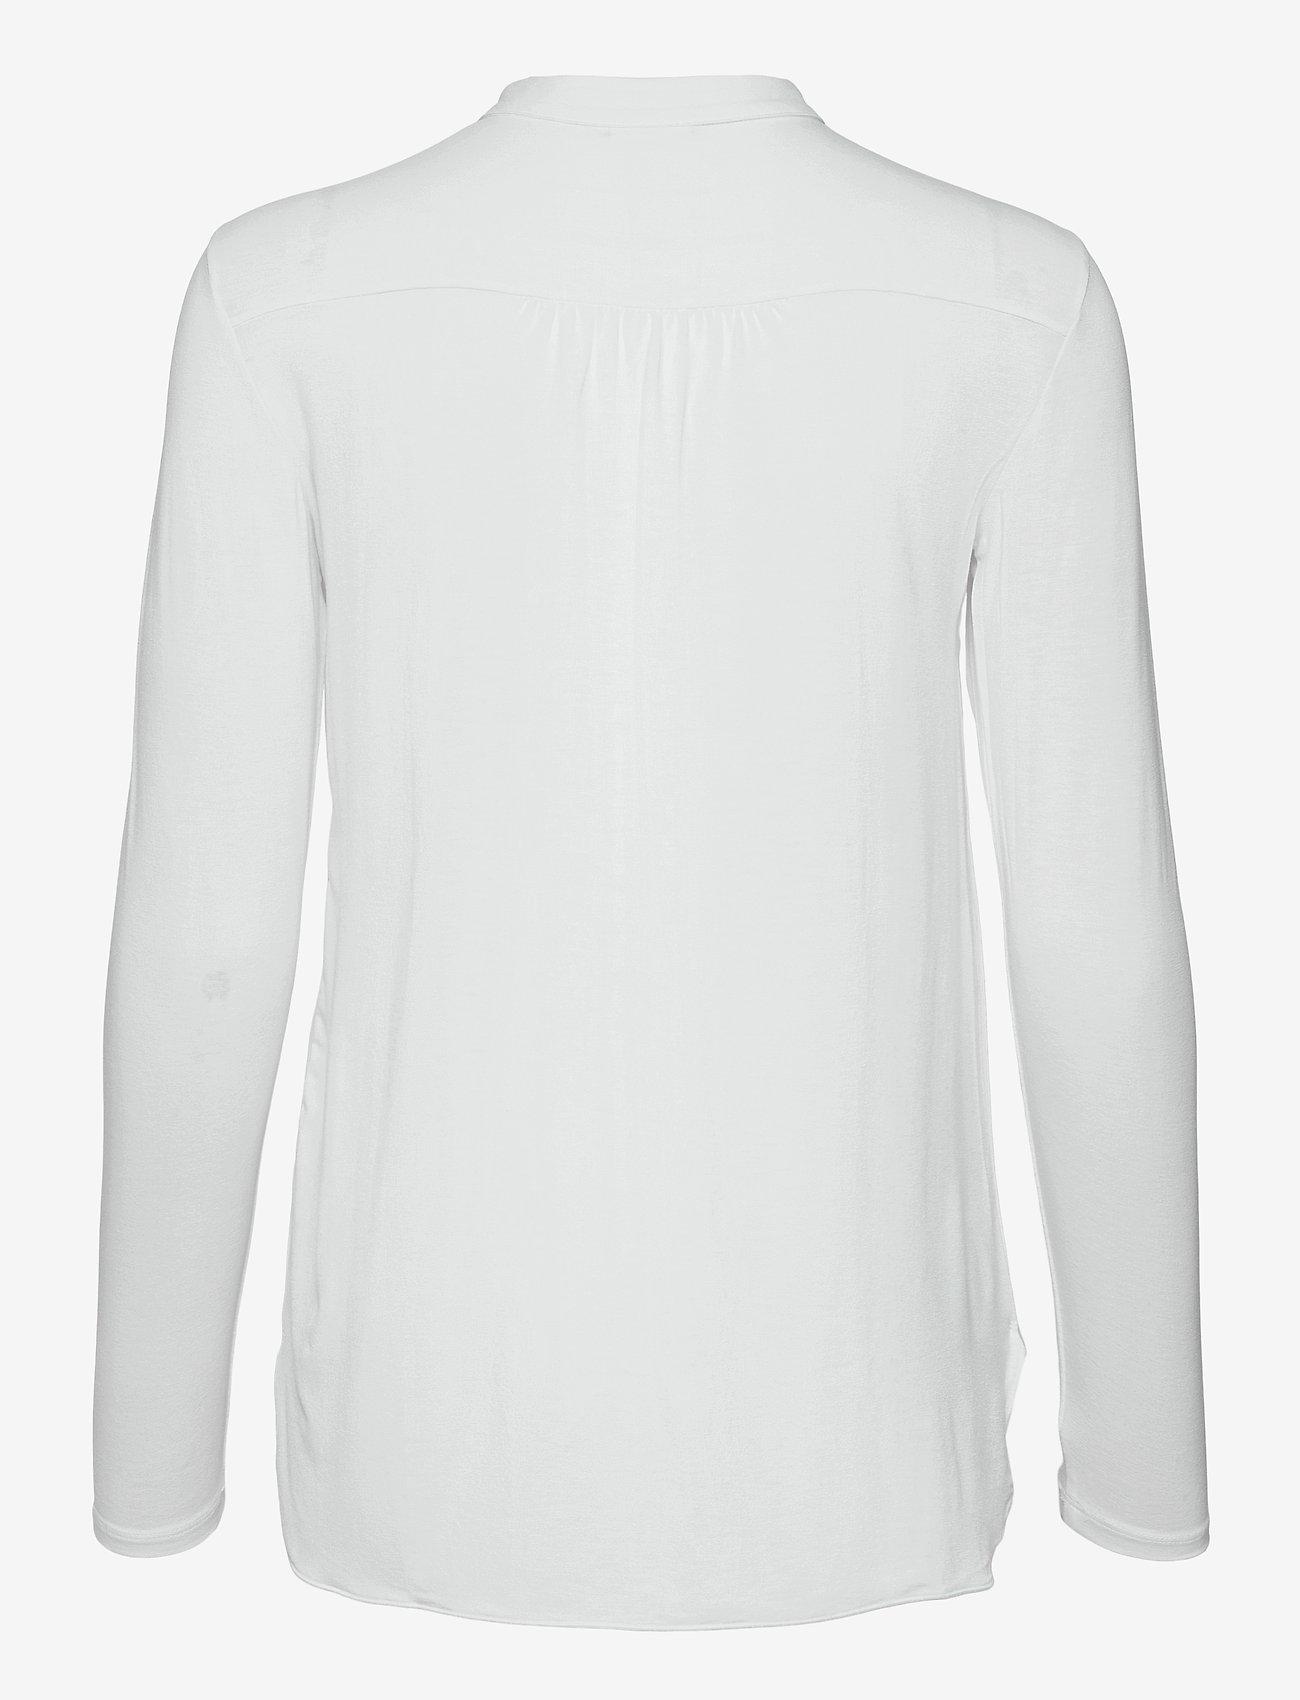 Max Mara Leisure - HAITI - long sleeved blouses - optical white - 1